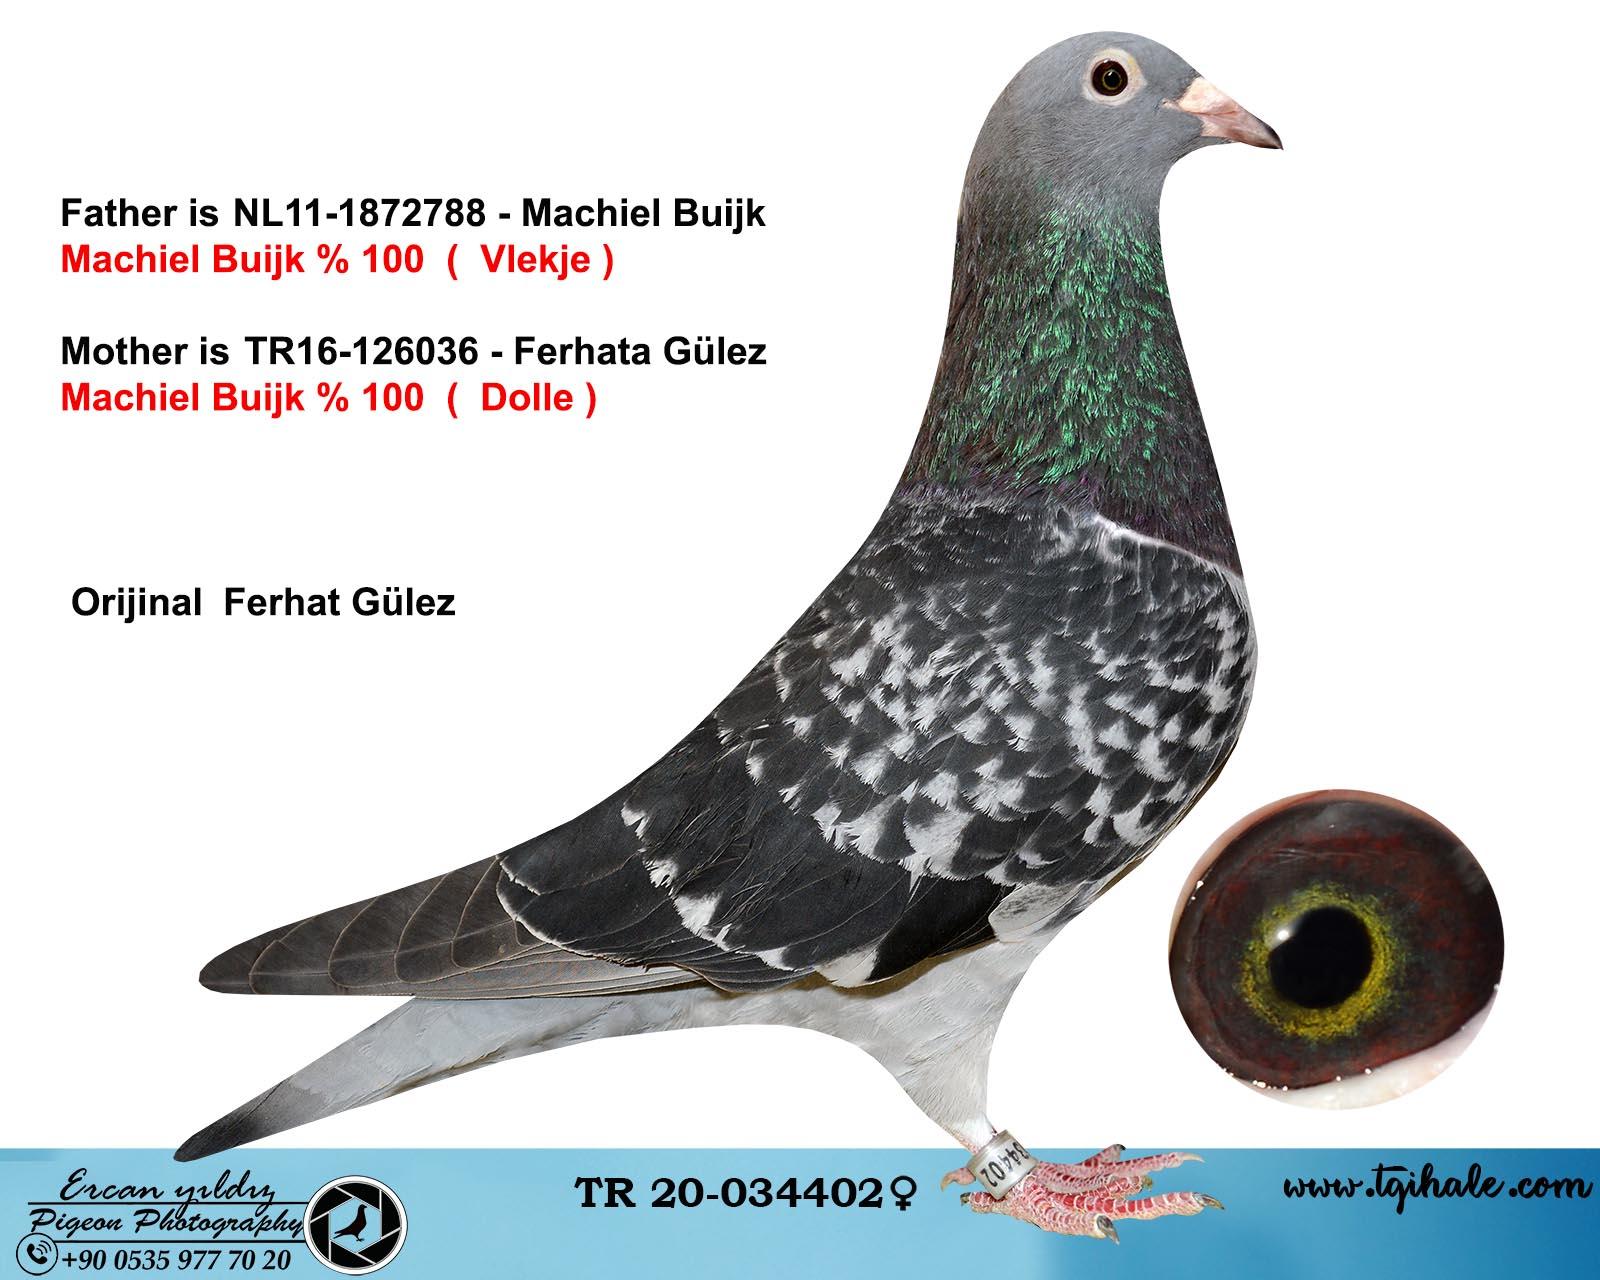 TR20-034402 DİŞİ / MACHIEL BUIJK DOLLA AARDEN % 100